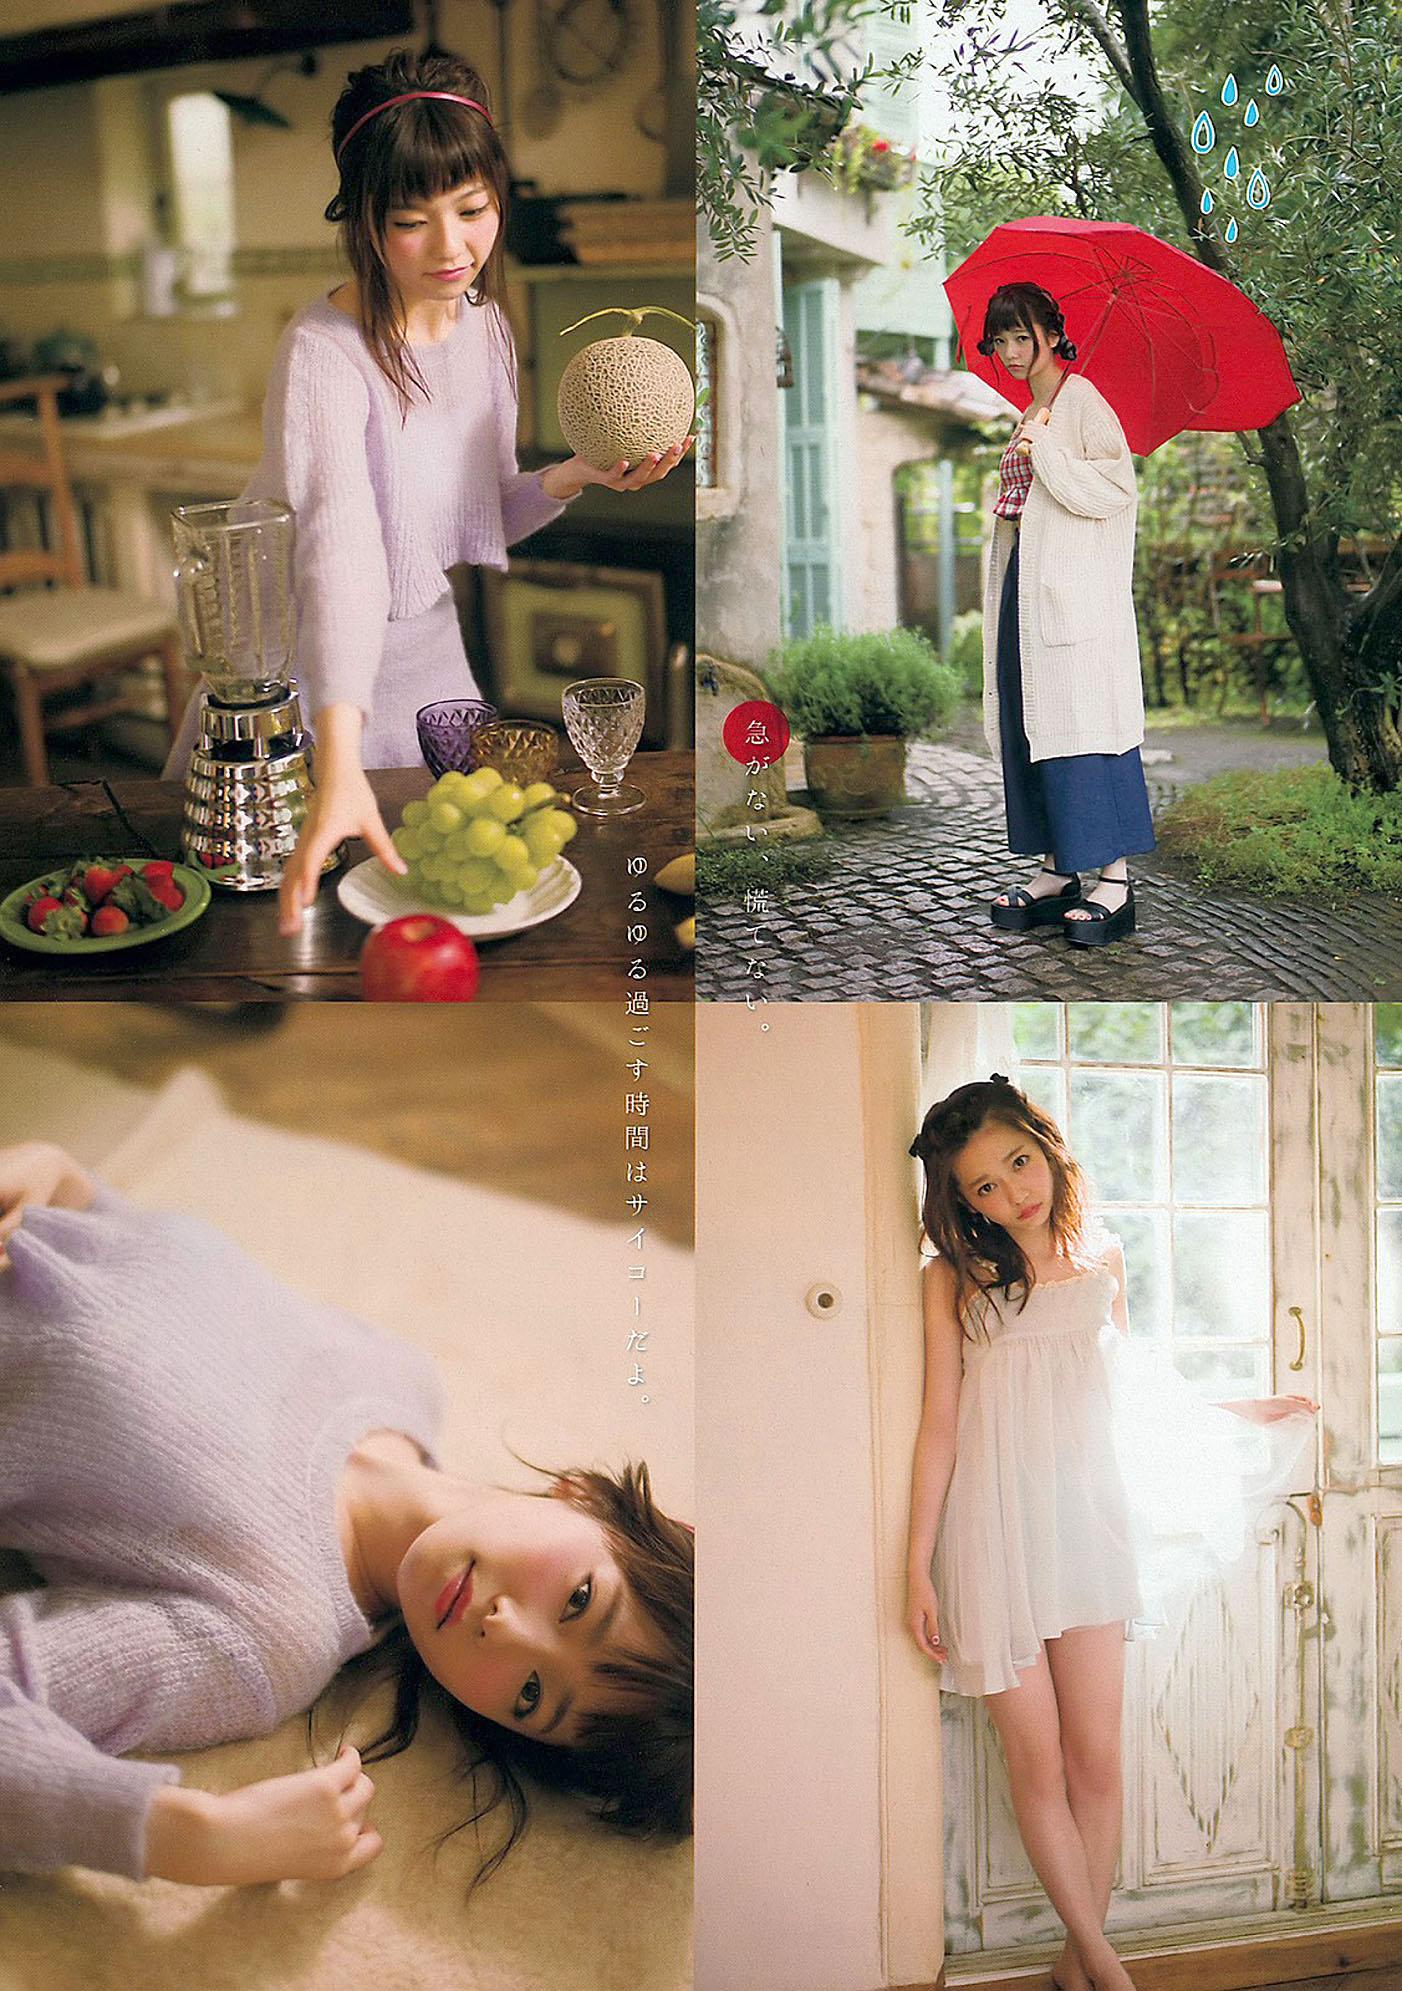 HShimazaki Young Magazine 141201 03.jpg